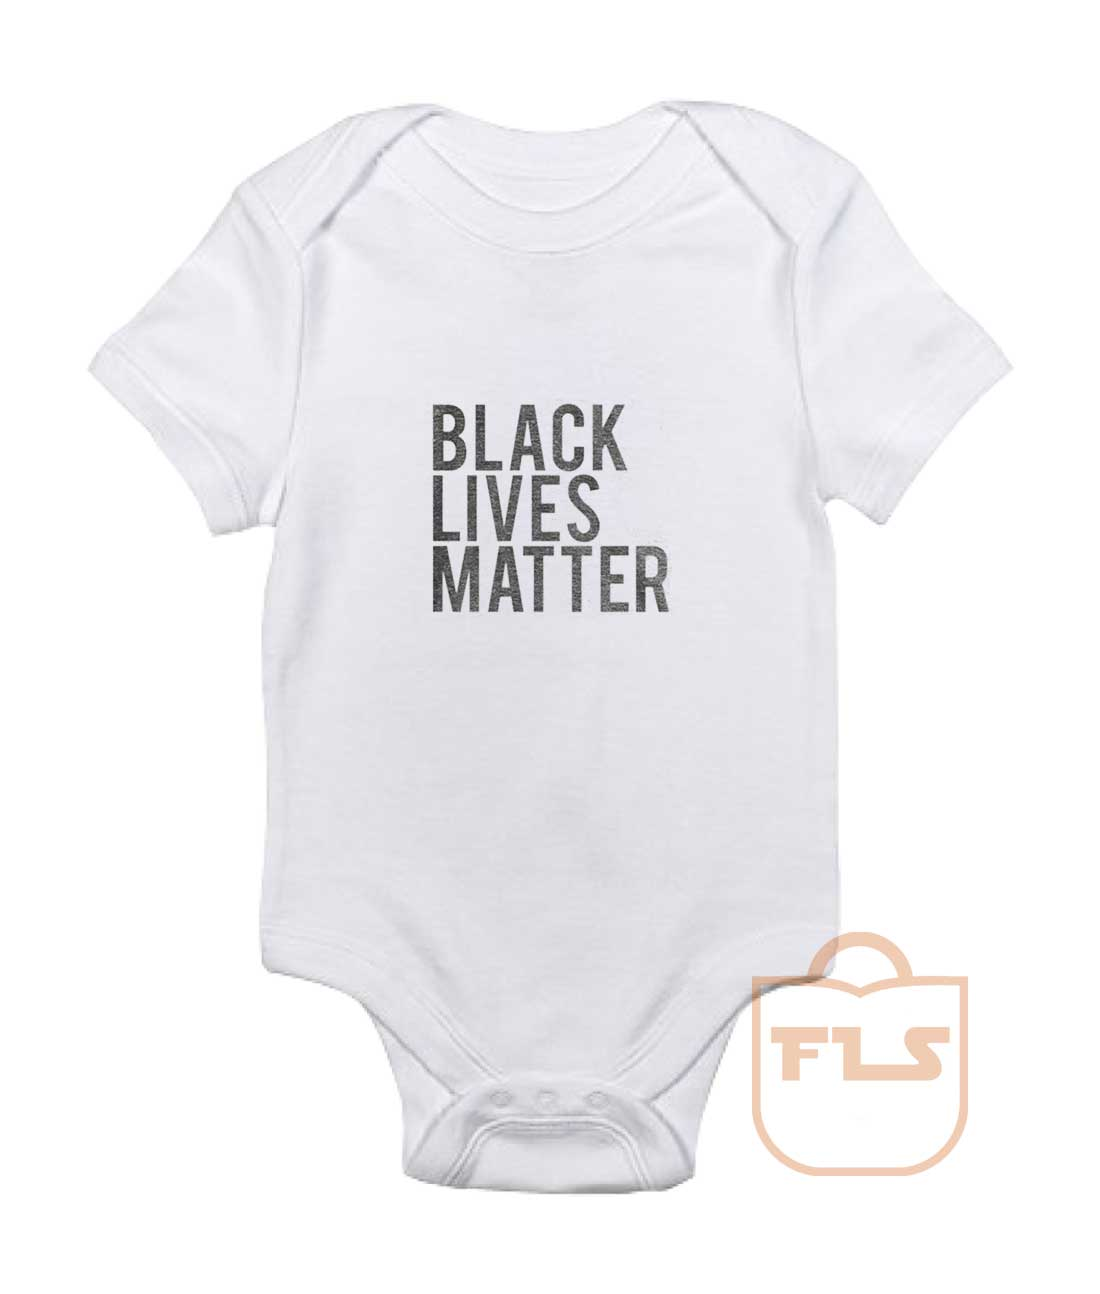 My life matters Black Lives Matter bodysuit newborn gift toddler bodysuit Baby Onesie,Baby bodysuit,Black History month onesie